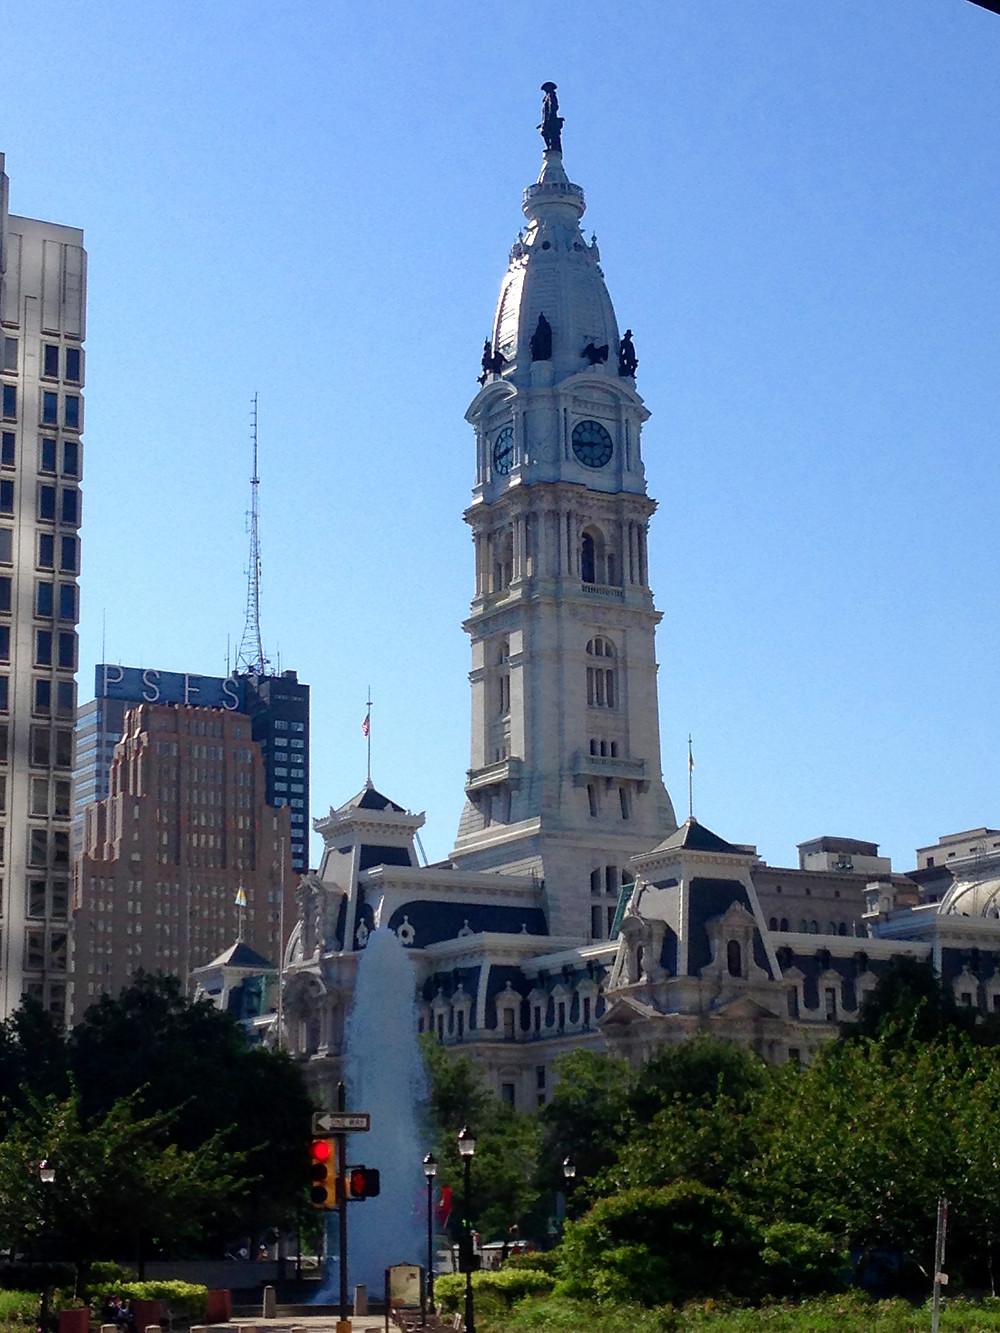 Escape Reno: Tour Bus in Philadelphia